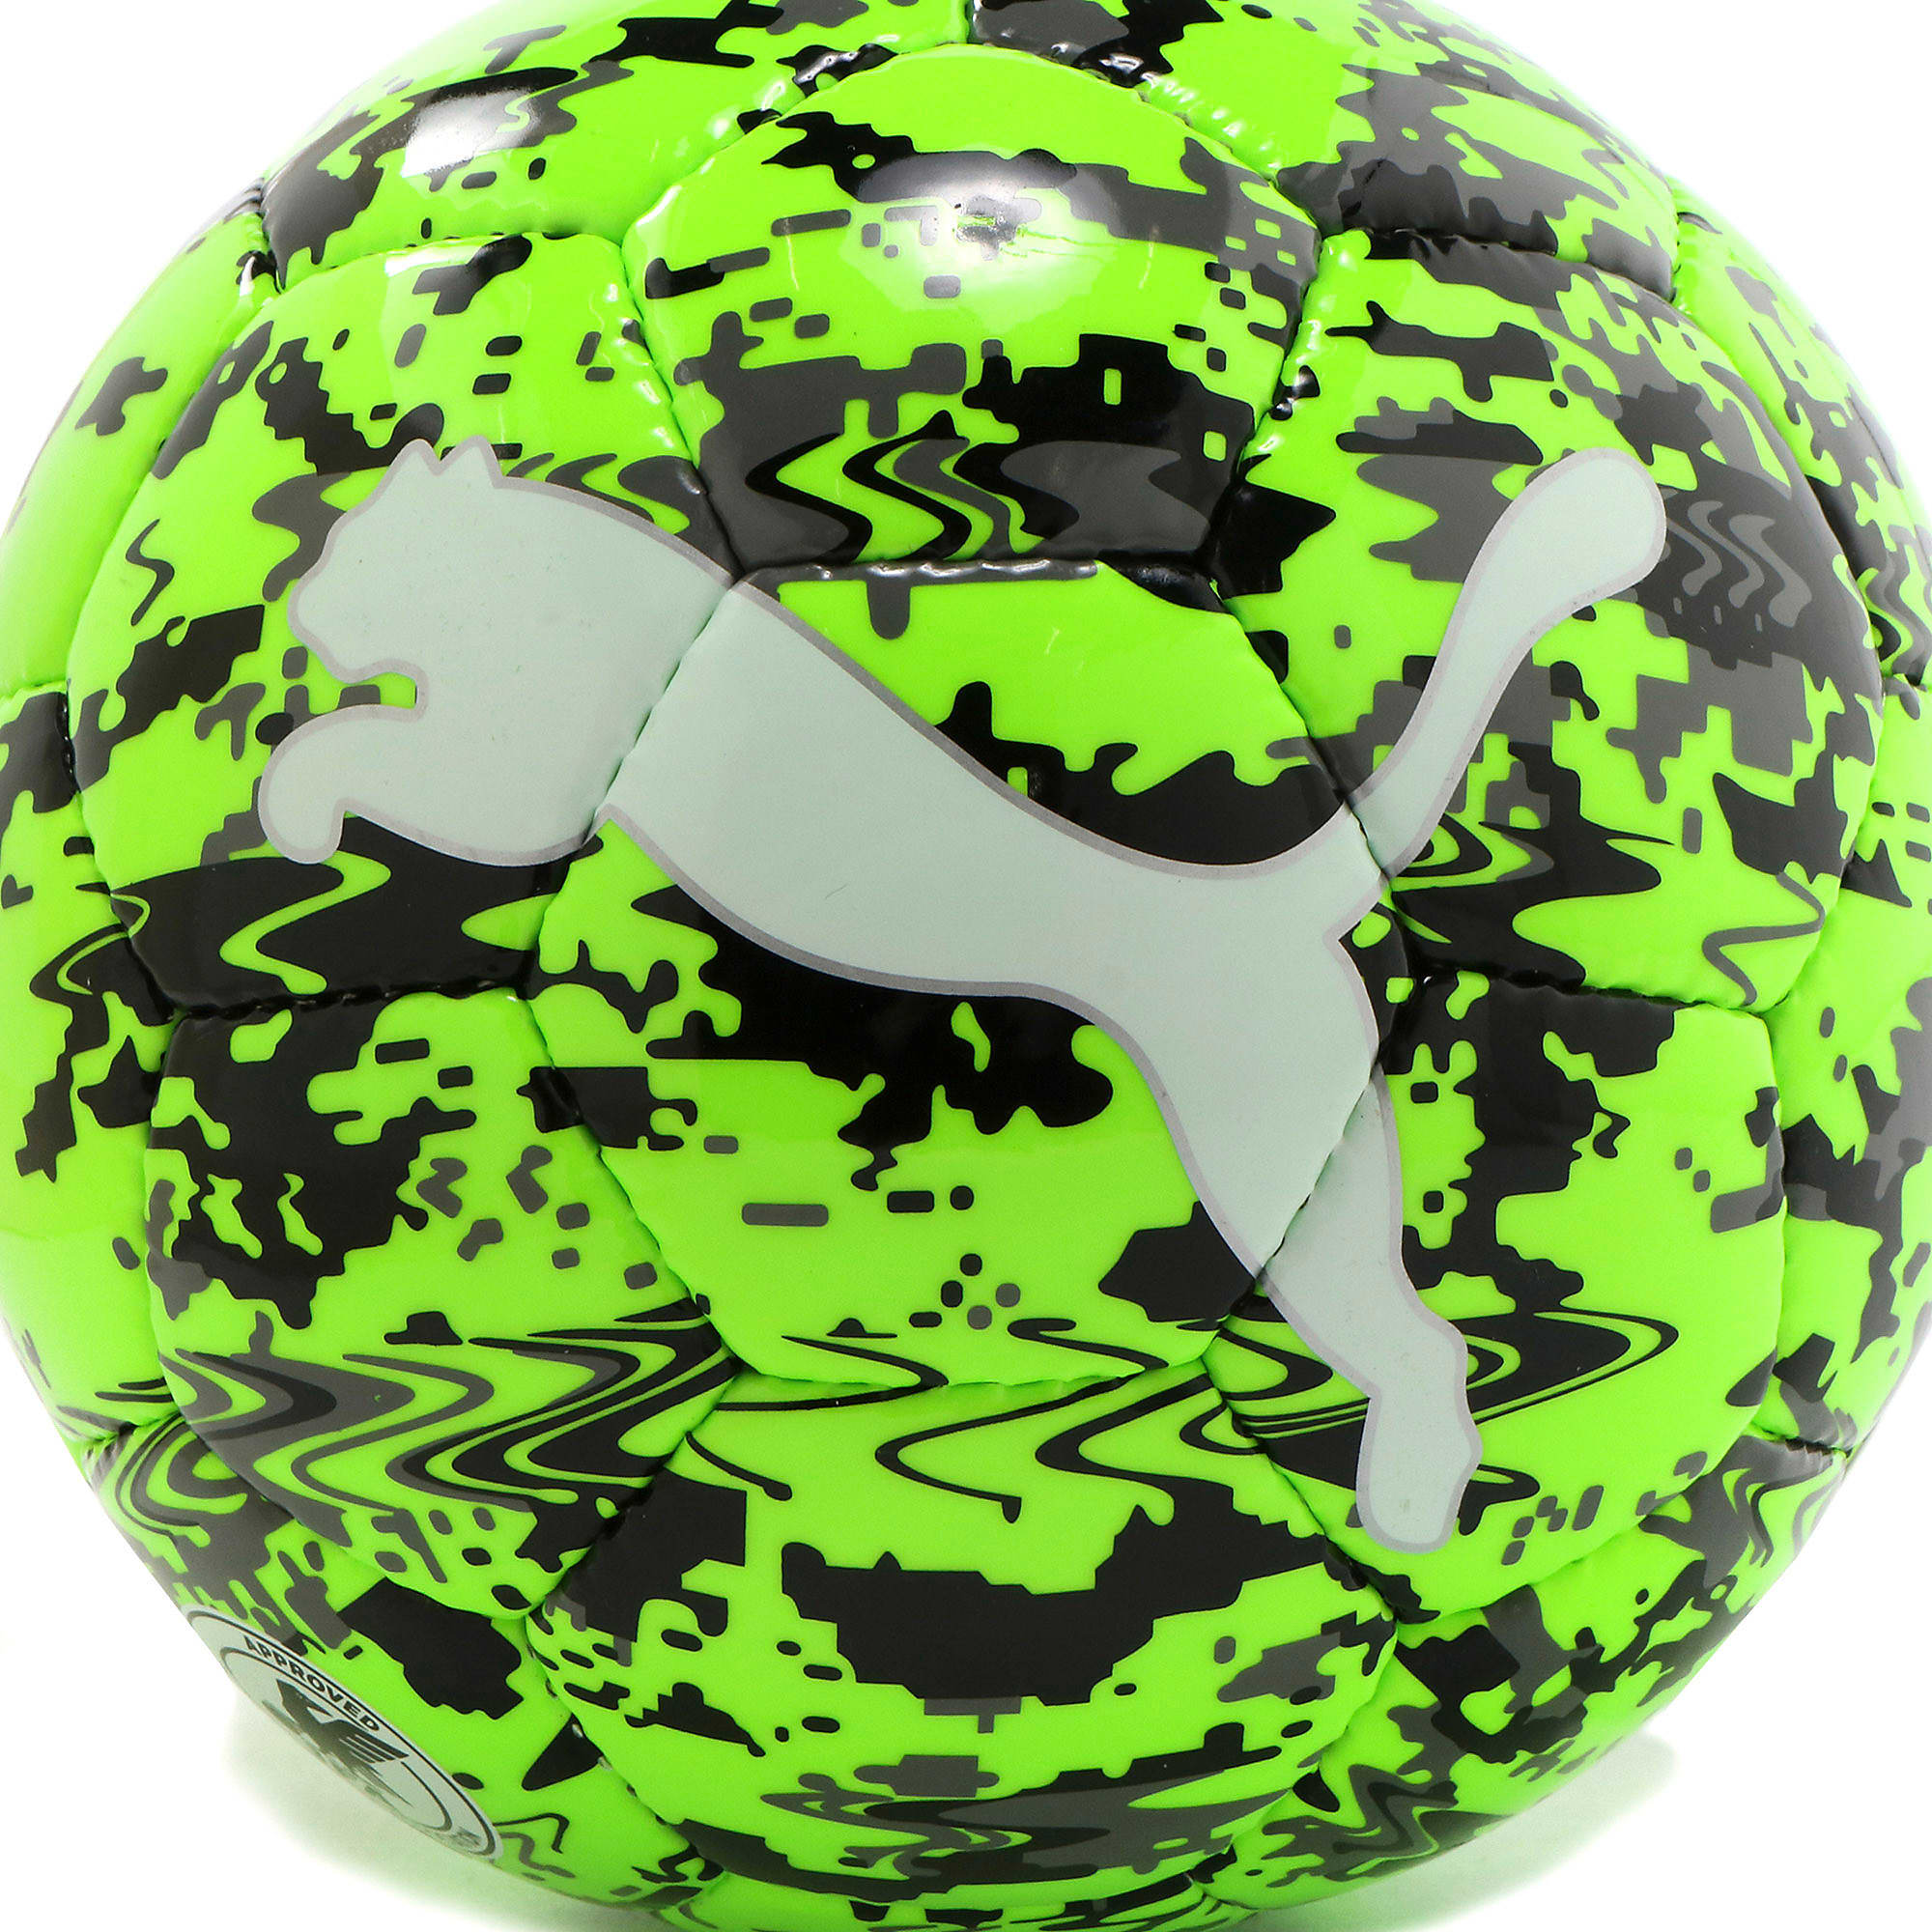 Thumbnail 3 of プーマ ワン レーザー サッカー ボール J, Green Gecko-Black-Gray, medium-JPN